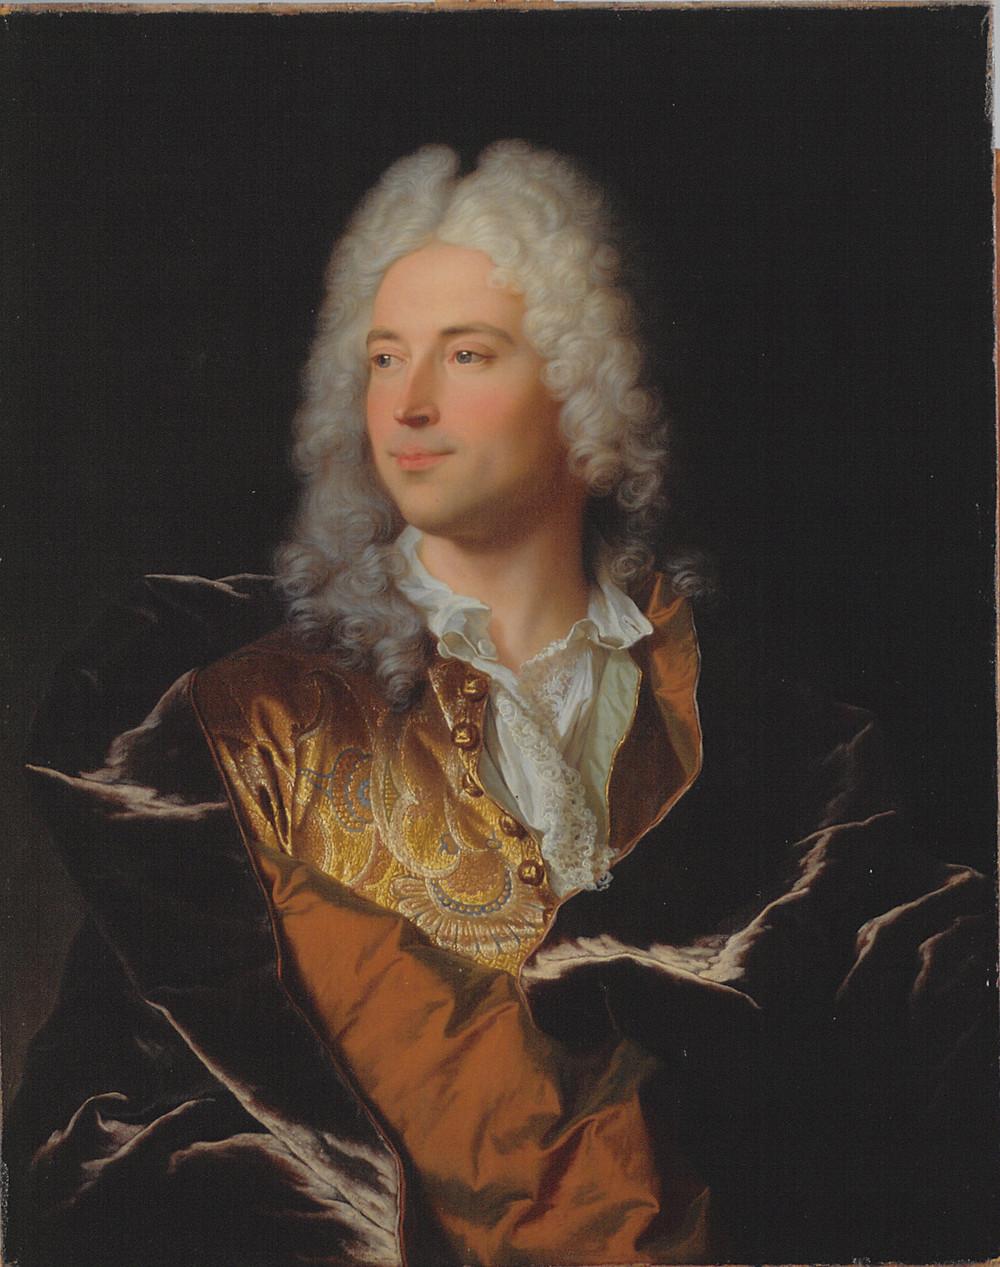 Hyacinthe Rigaud, Portrait de Lukas Schaub, 1721-1722, Bâle, Kunstmuseum, inv. 505